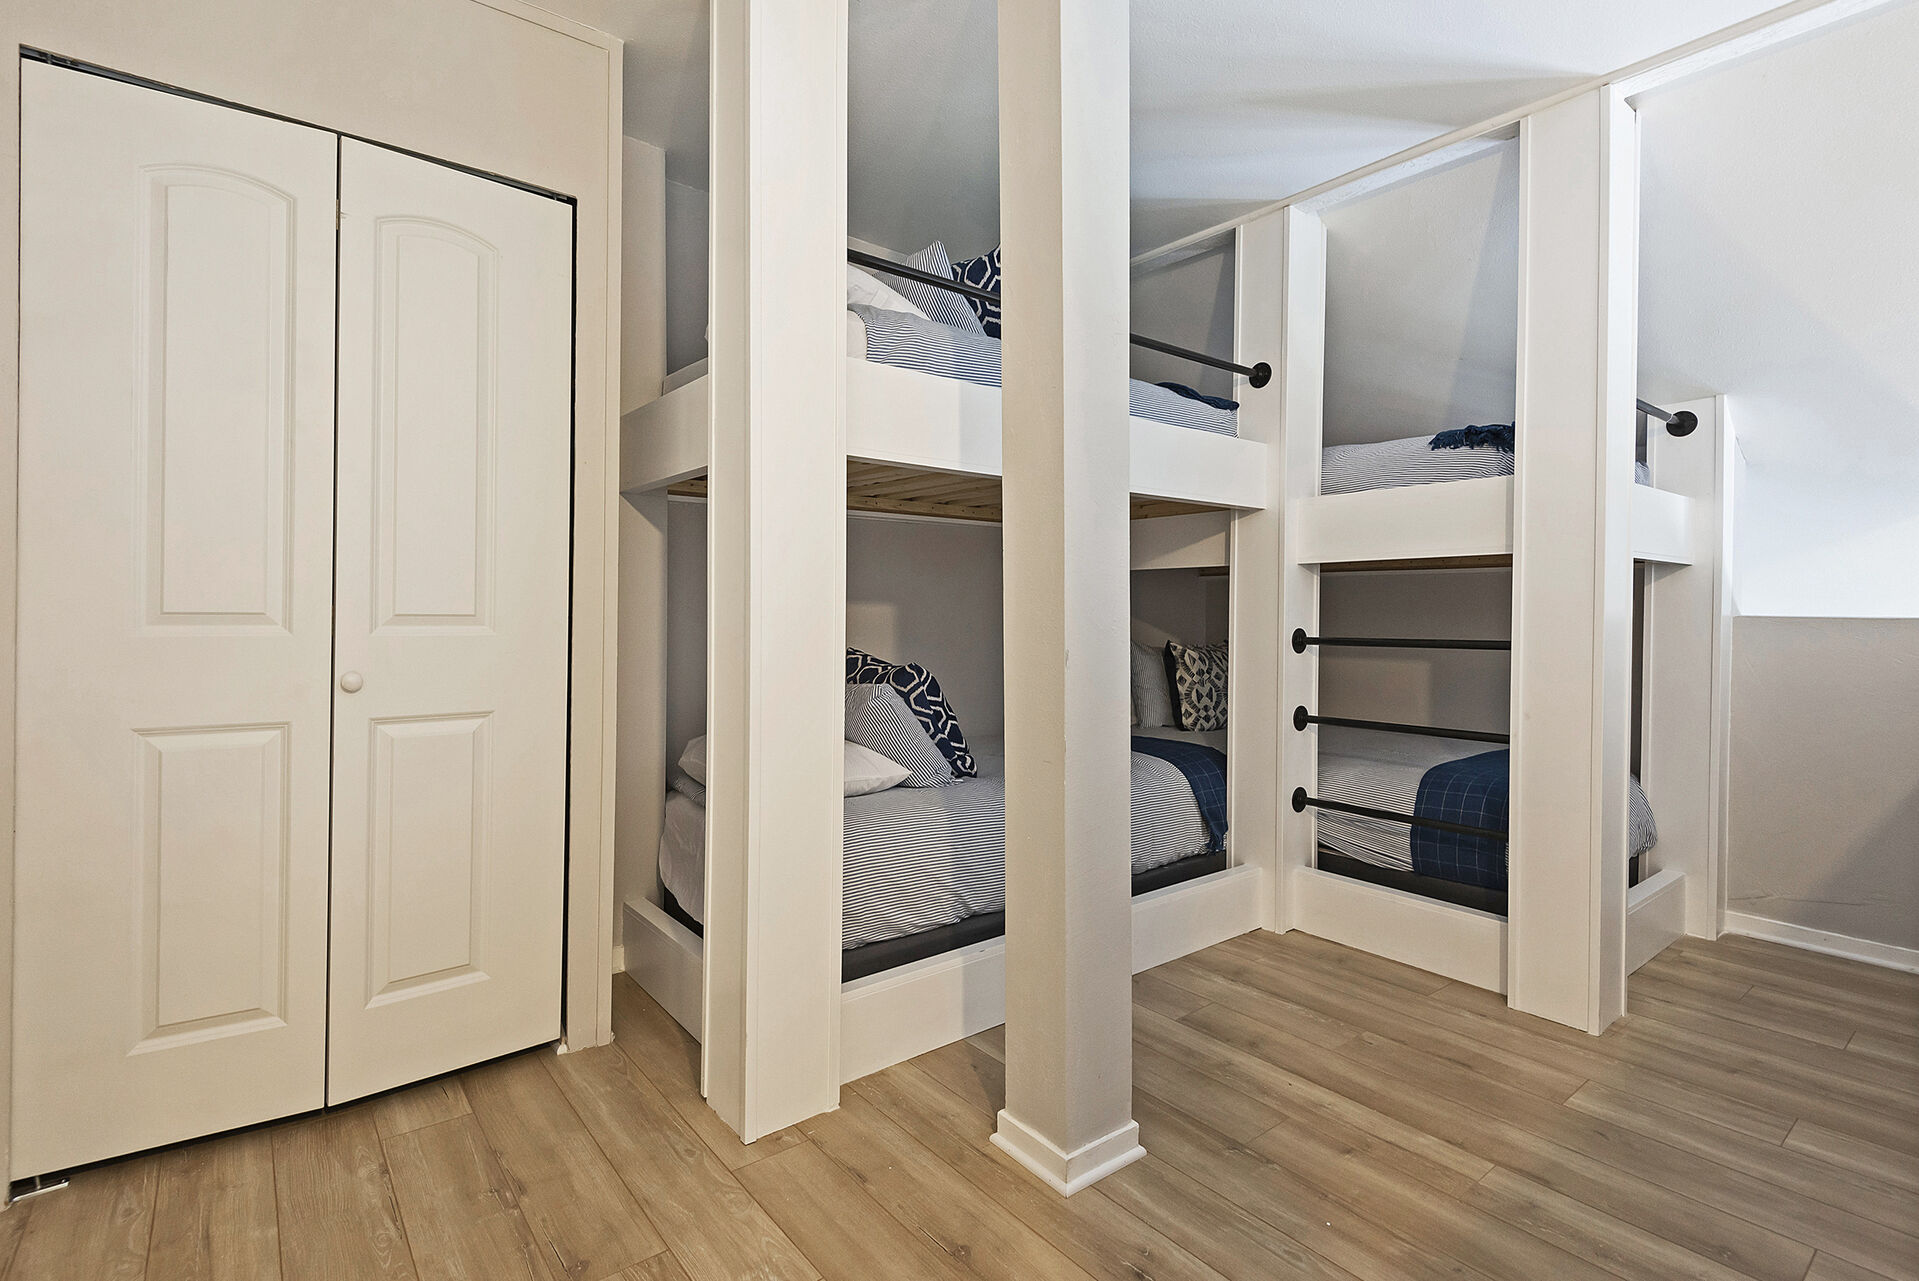 Loft Bunk Room with Custom Built Twin over Twin Bunk Beds